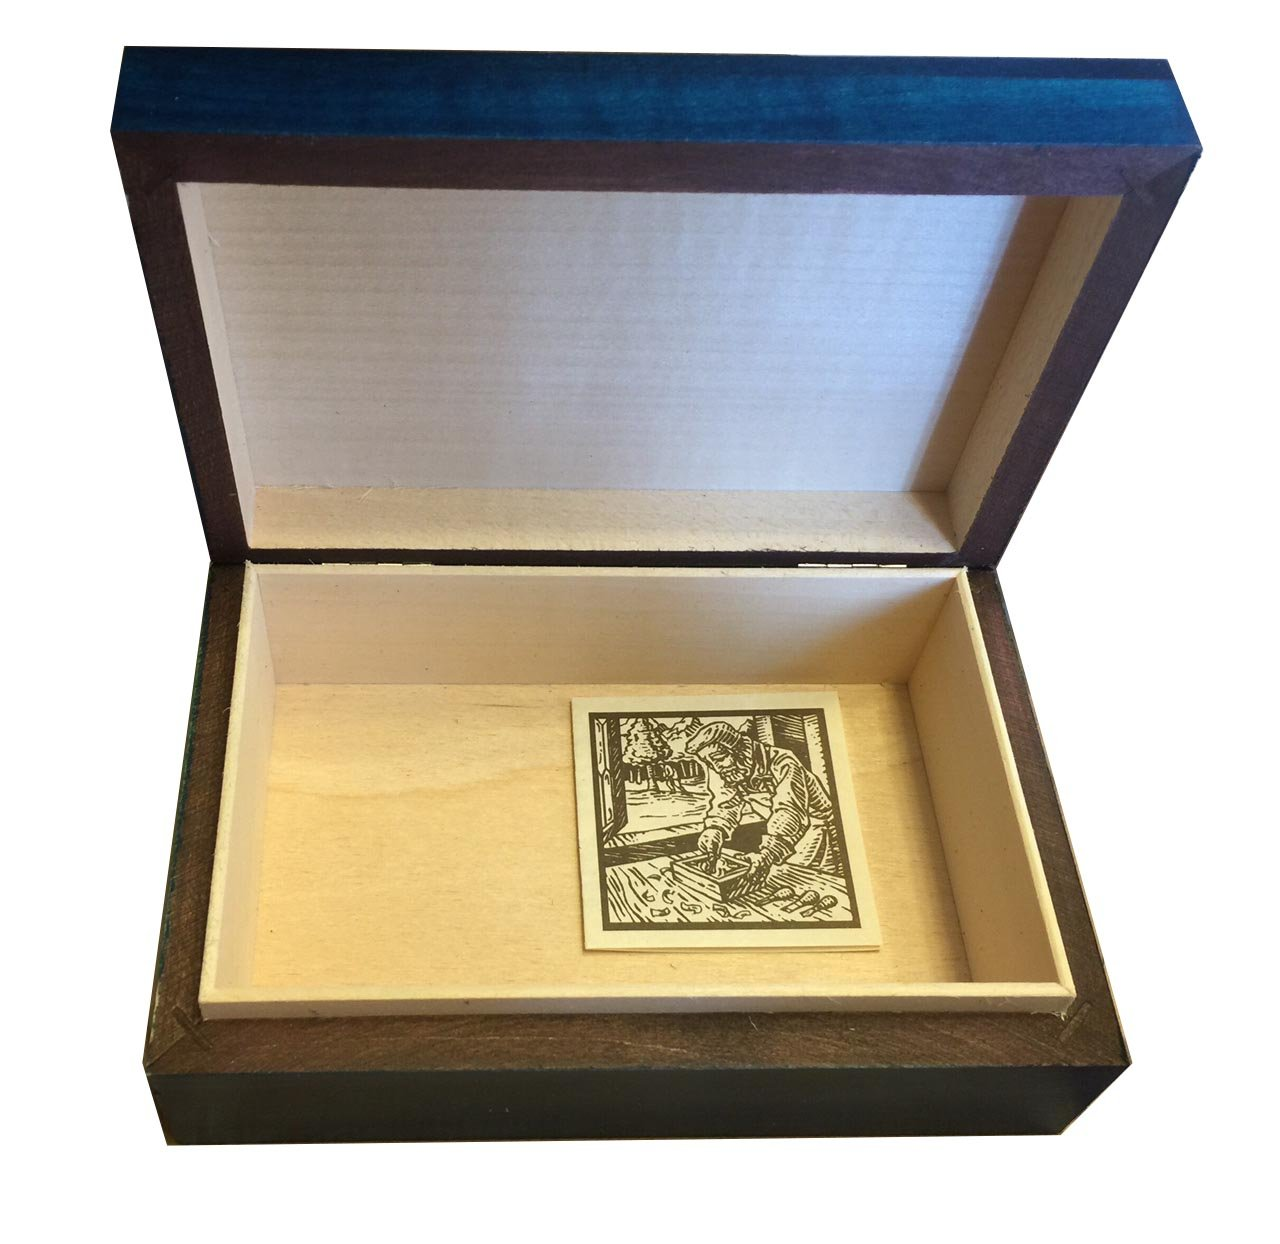 SEWING BOX Polish Handmade Wood Art Keepsake Unique Masterpiece Exclusive Gift